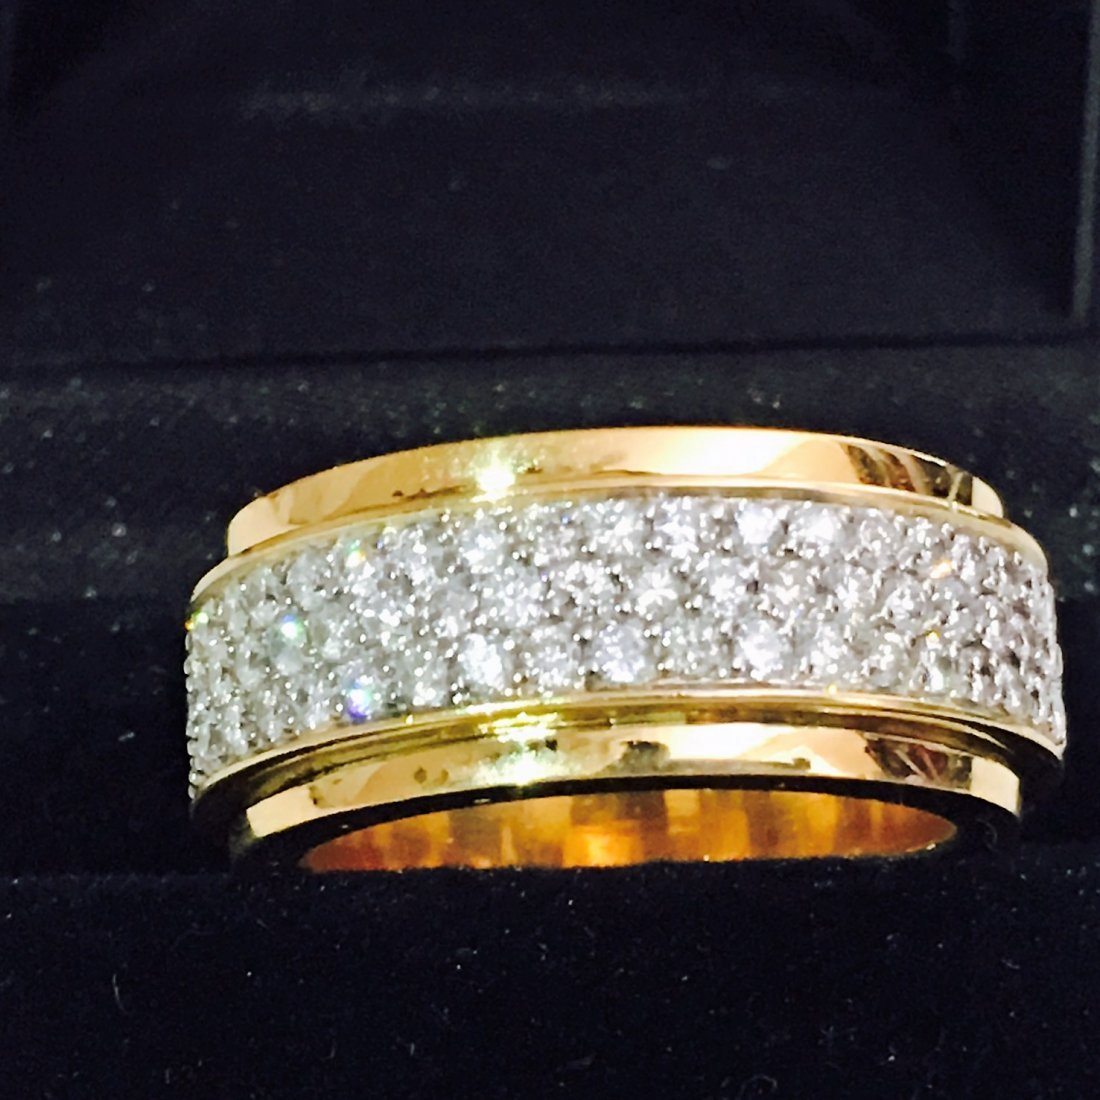 18k Yellow Gold, 4.50 Carat VVS Diamond Ring - 3